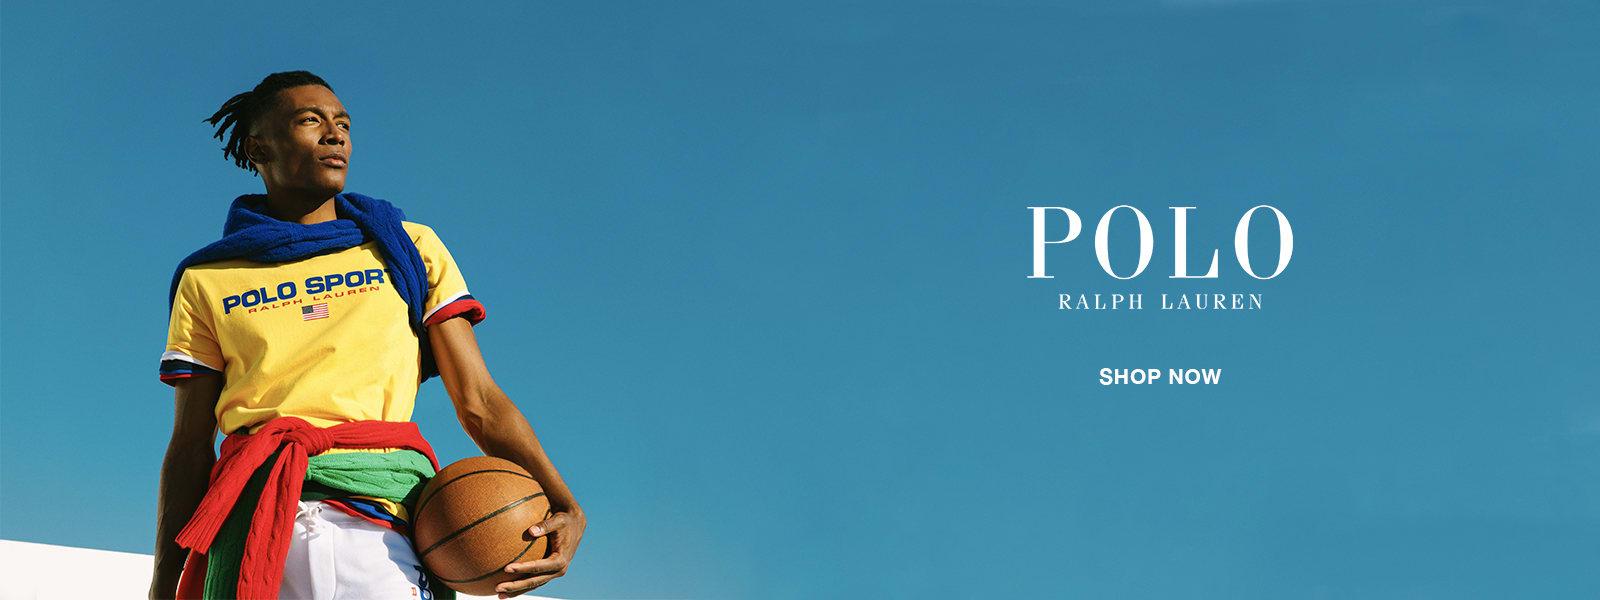 POLO - Ralph Lauren - Shop Now